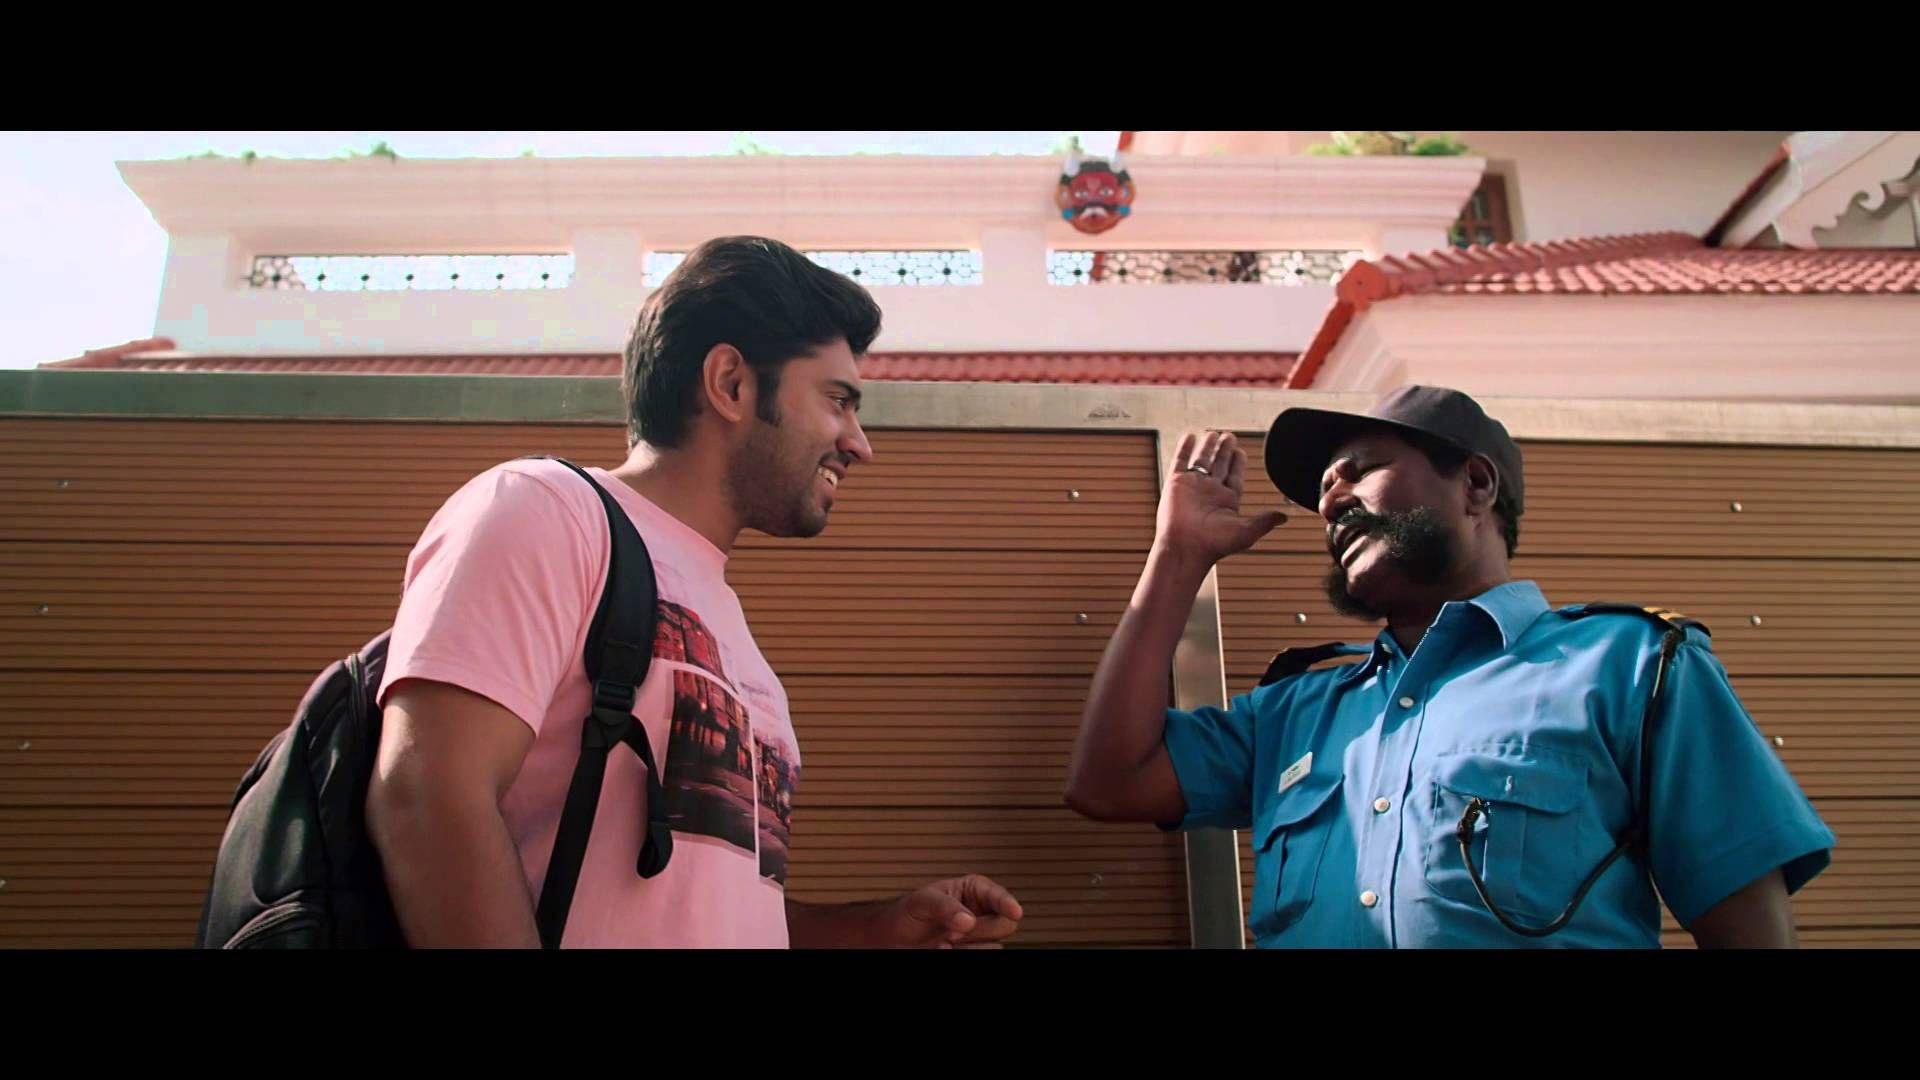 Oru Vadn Selfie Song Neelambalin All Malayalam Movie Songs At Http Indianwap Music S Pinterest